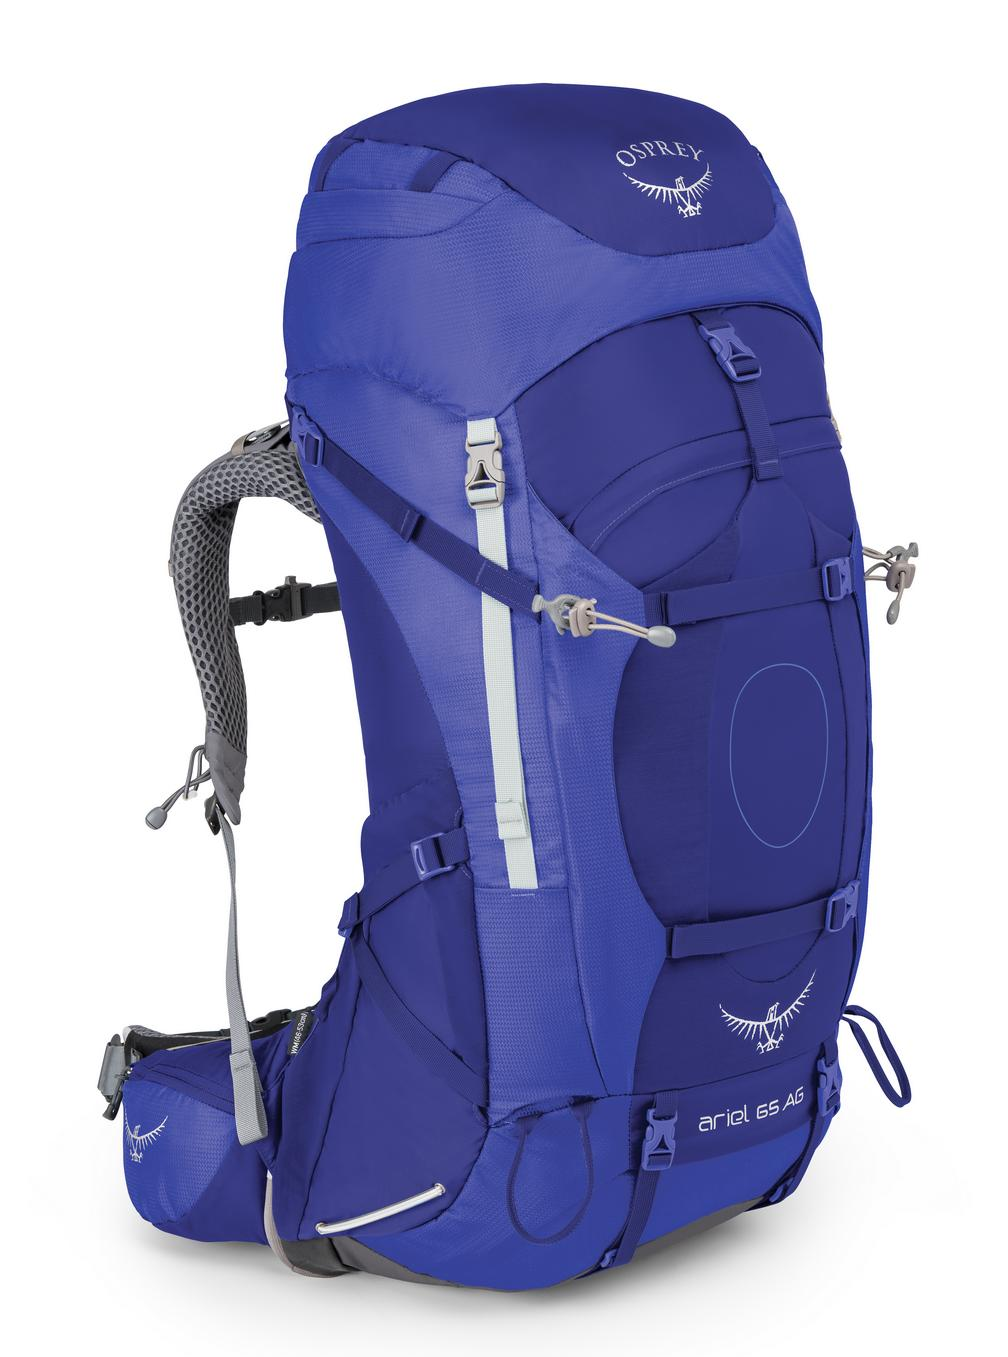 0a385625c3 Osprey ARIEL AG 65 - tidial blue Velikosti  M